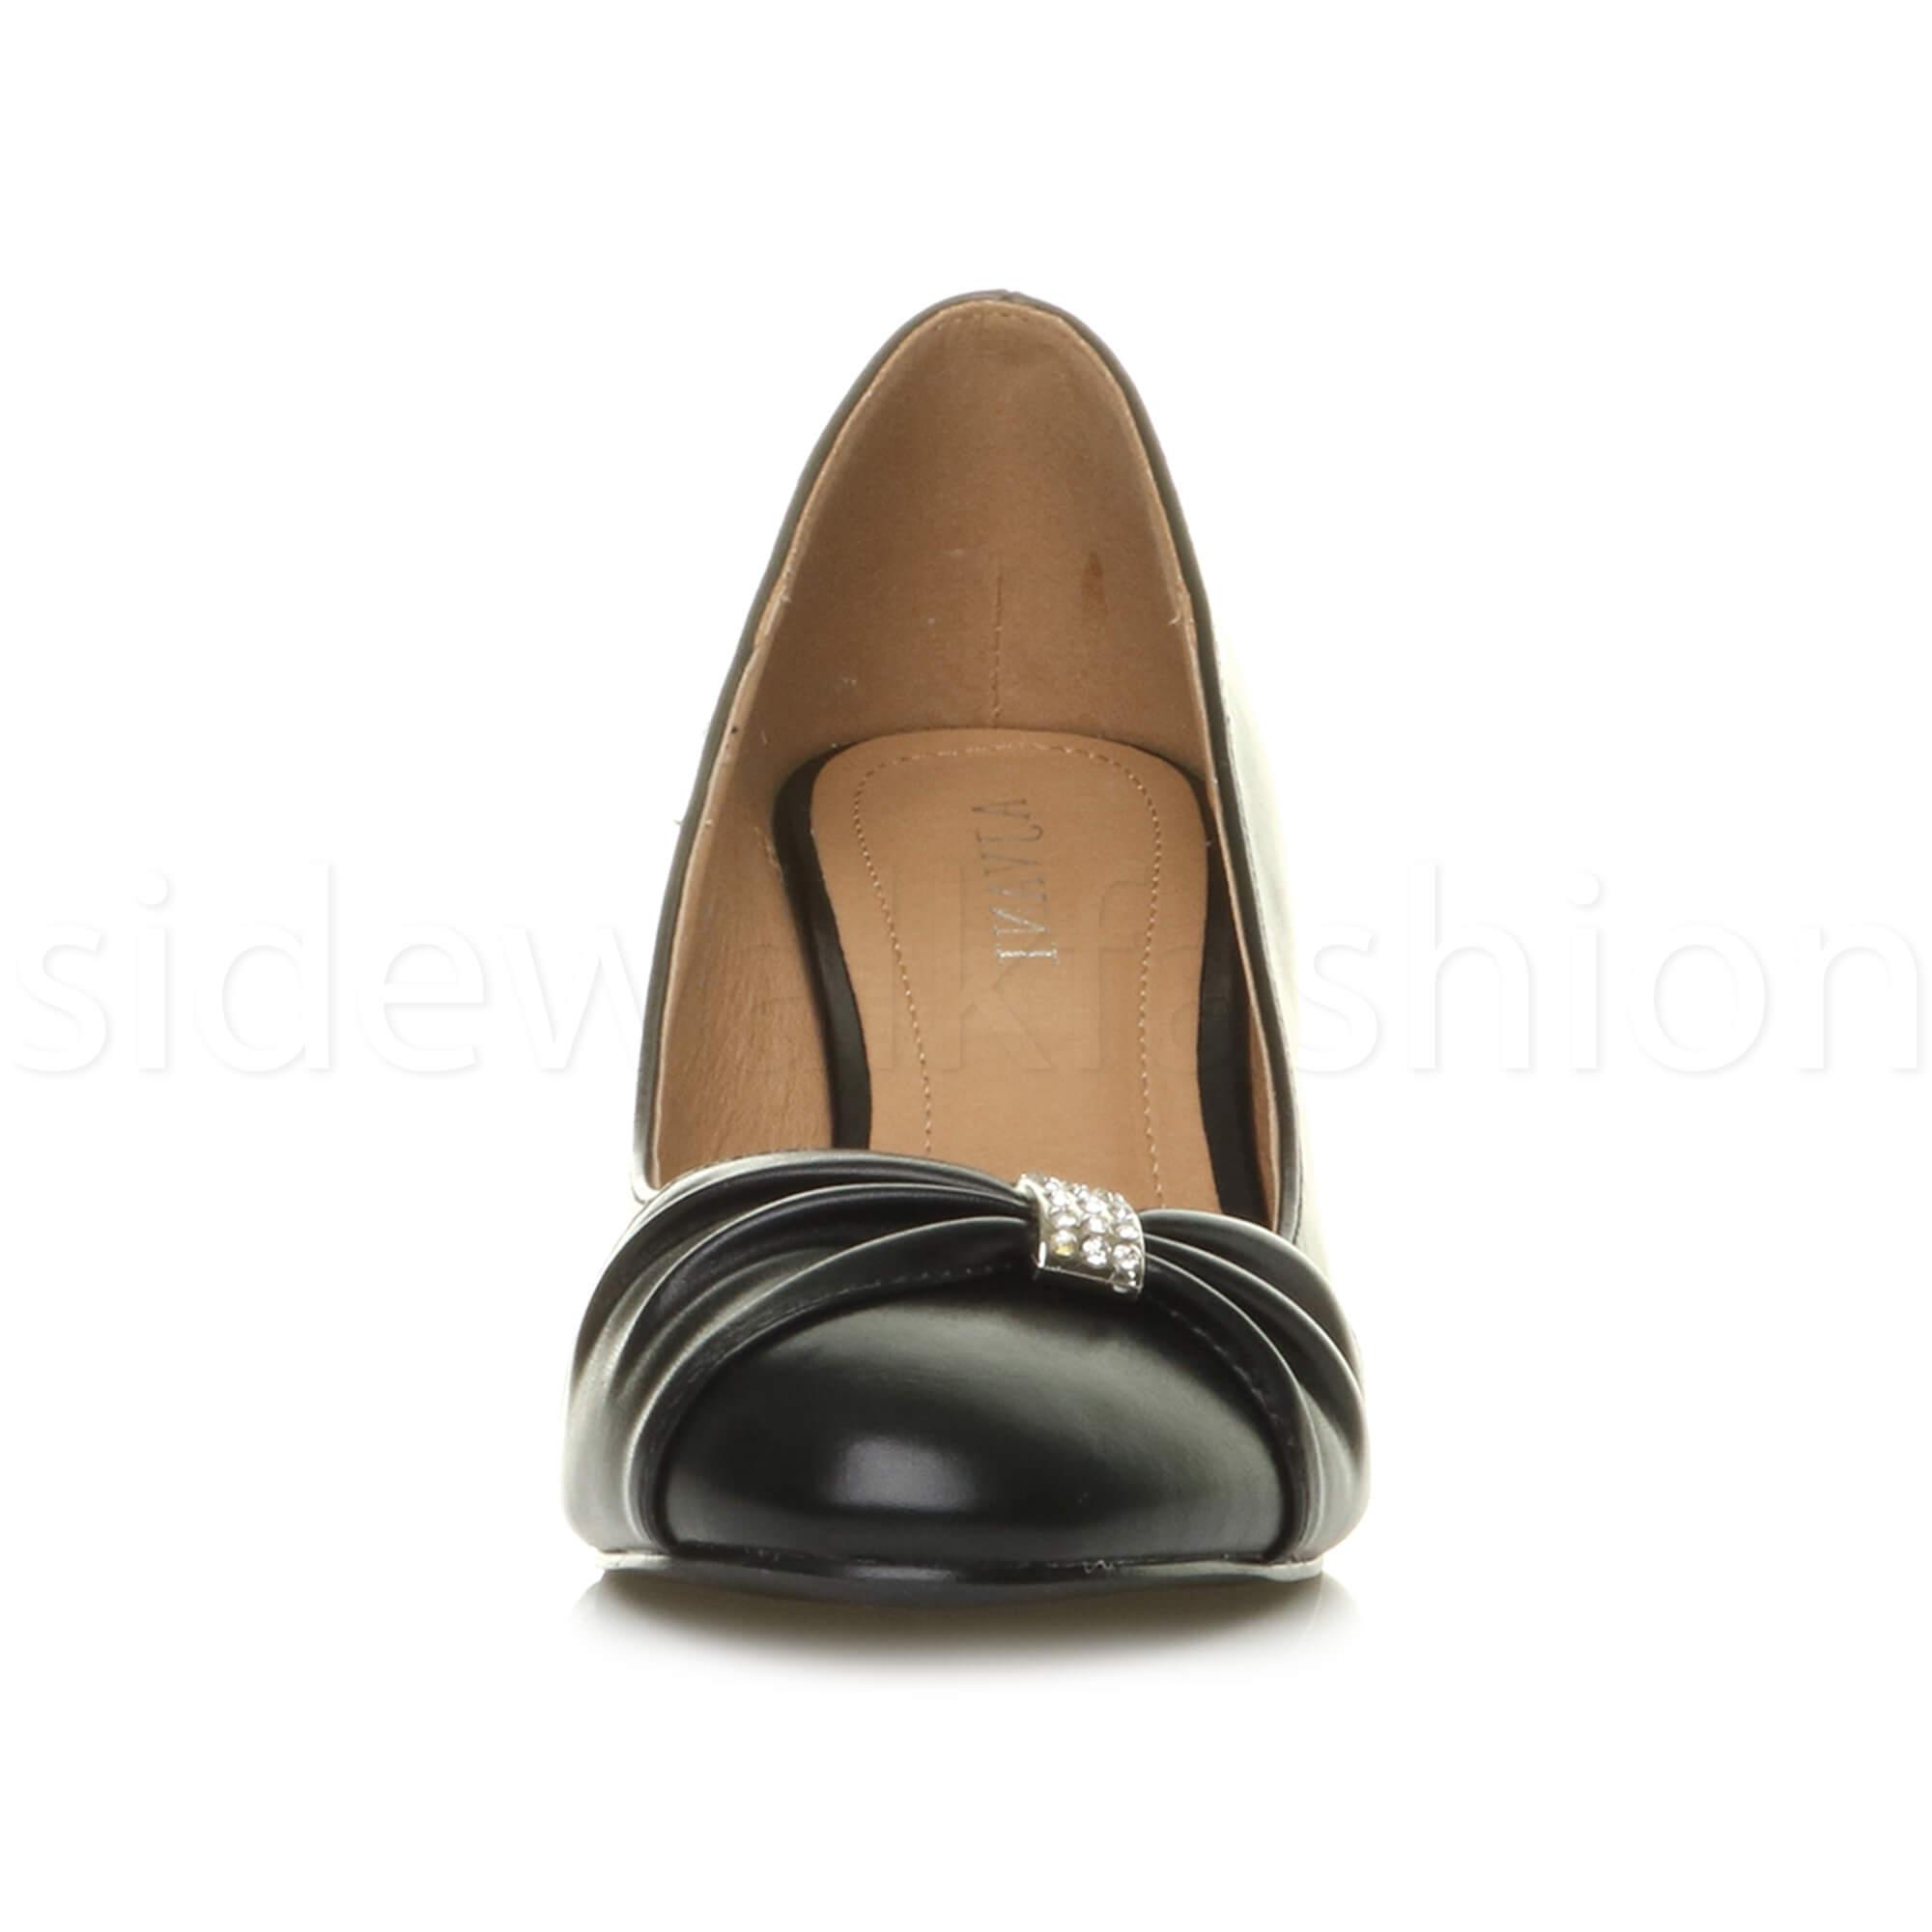 Womens-ladies-low-mid-heel-diamante-party-smart-evening-court-shoes-size thumbnail 7